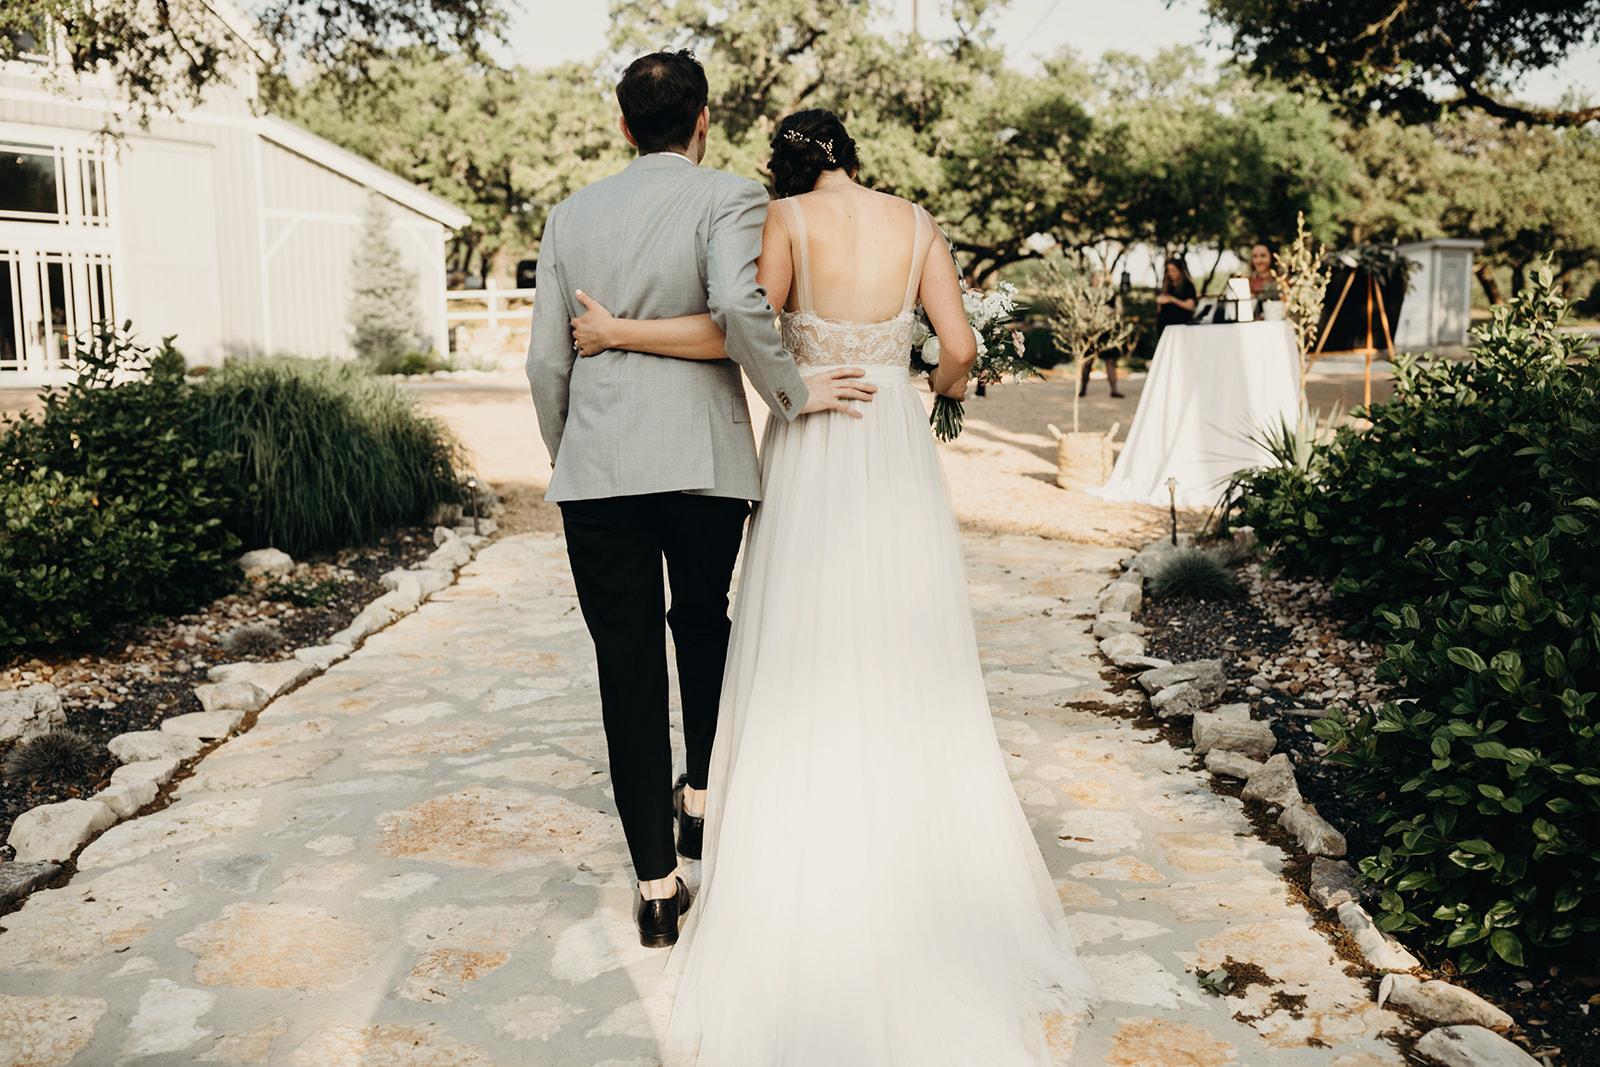 austin-wedding-lindsey-bryce-408.jpg